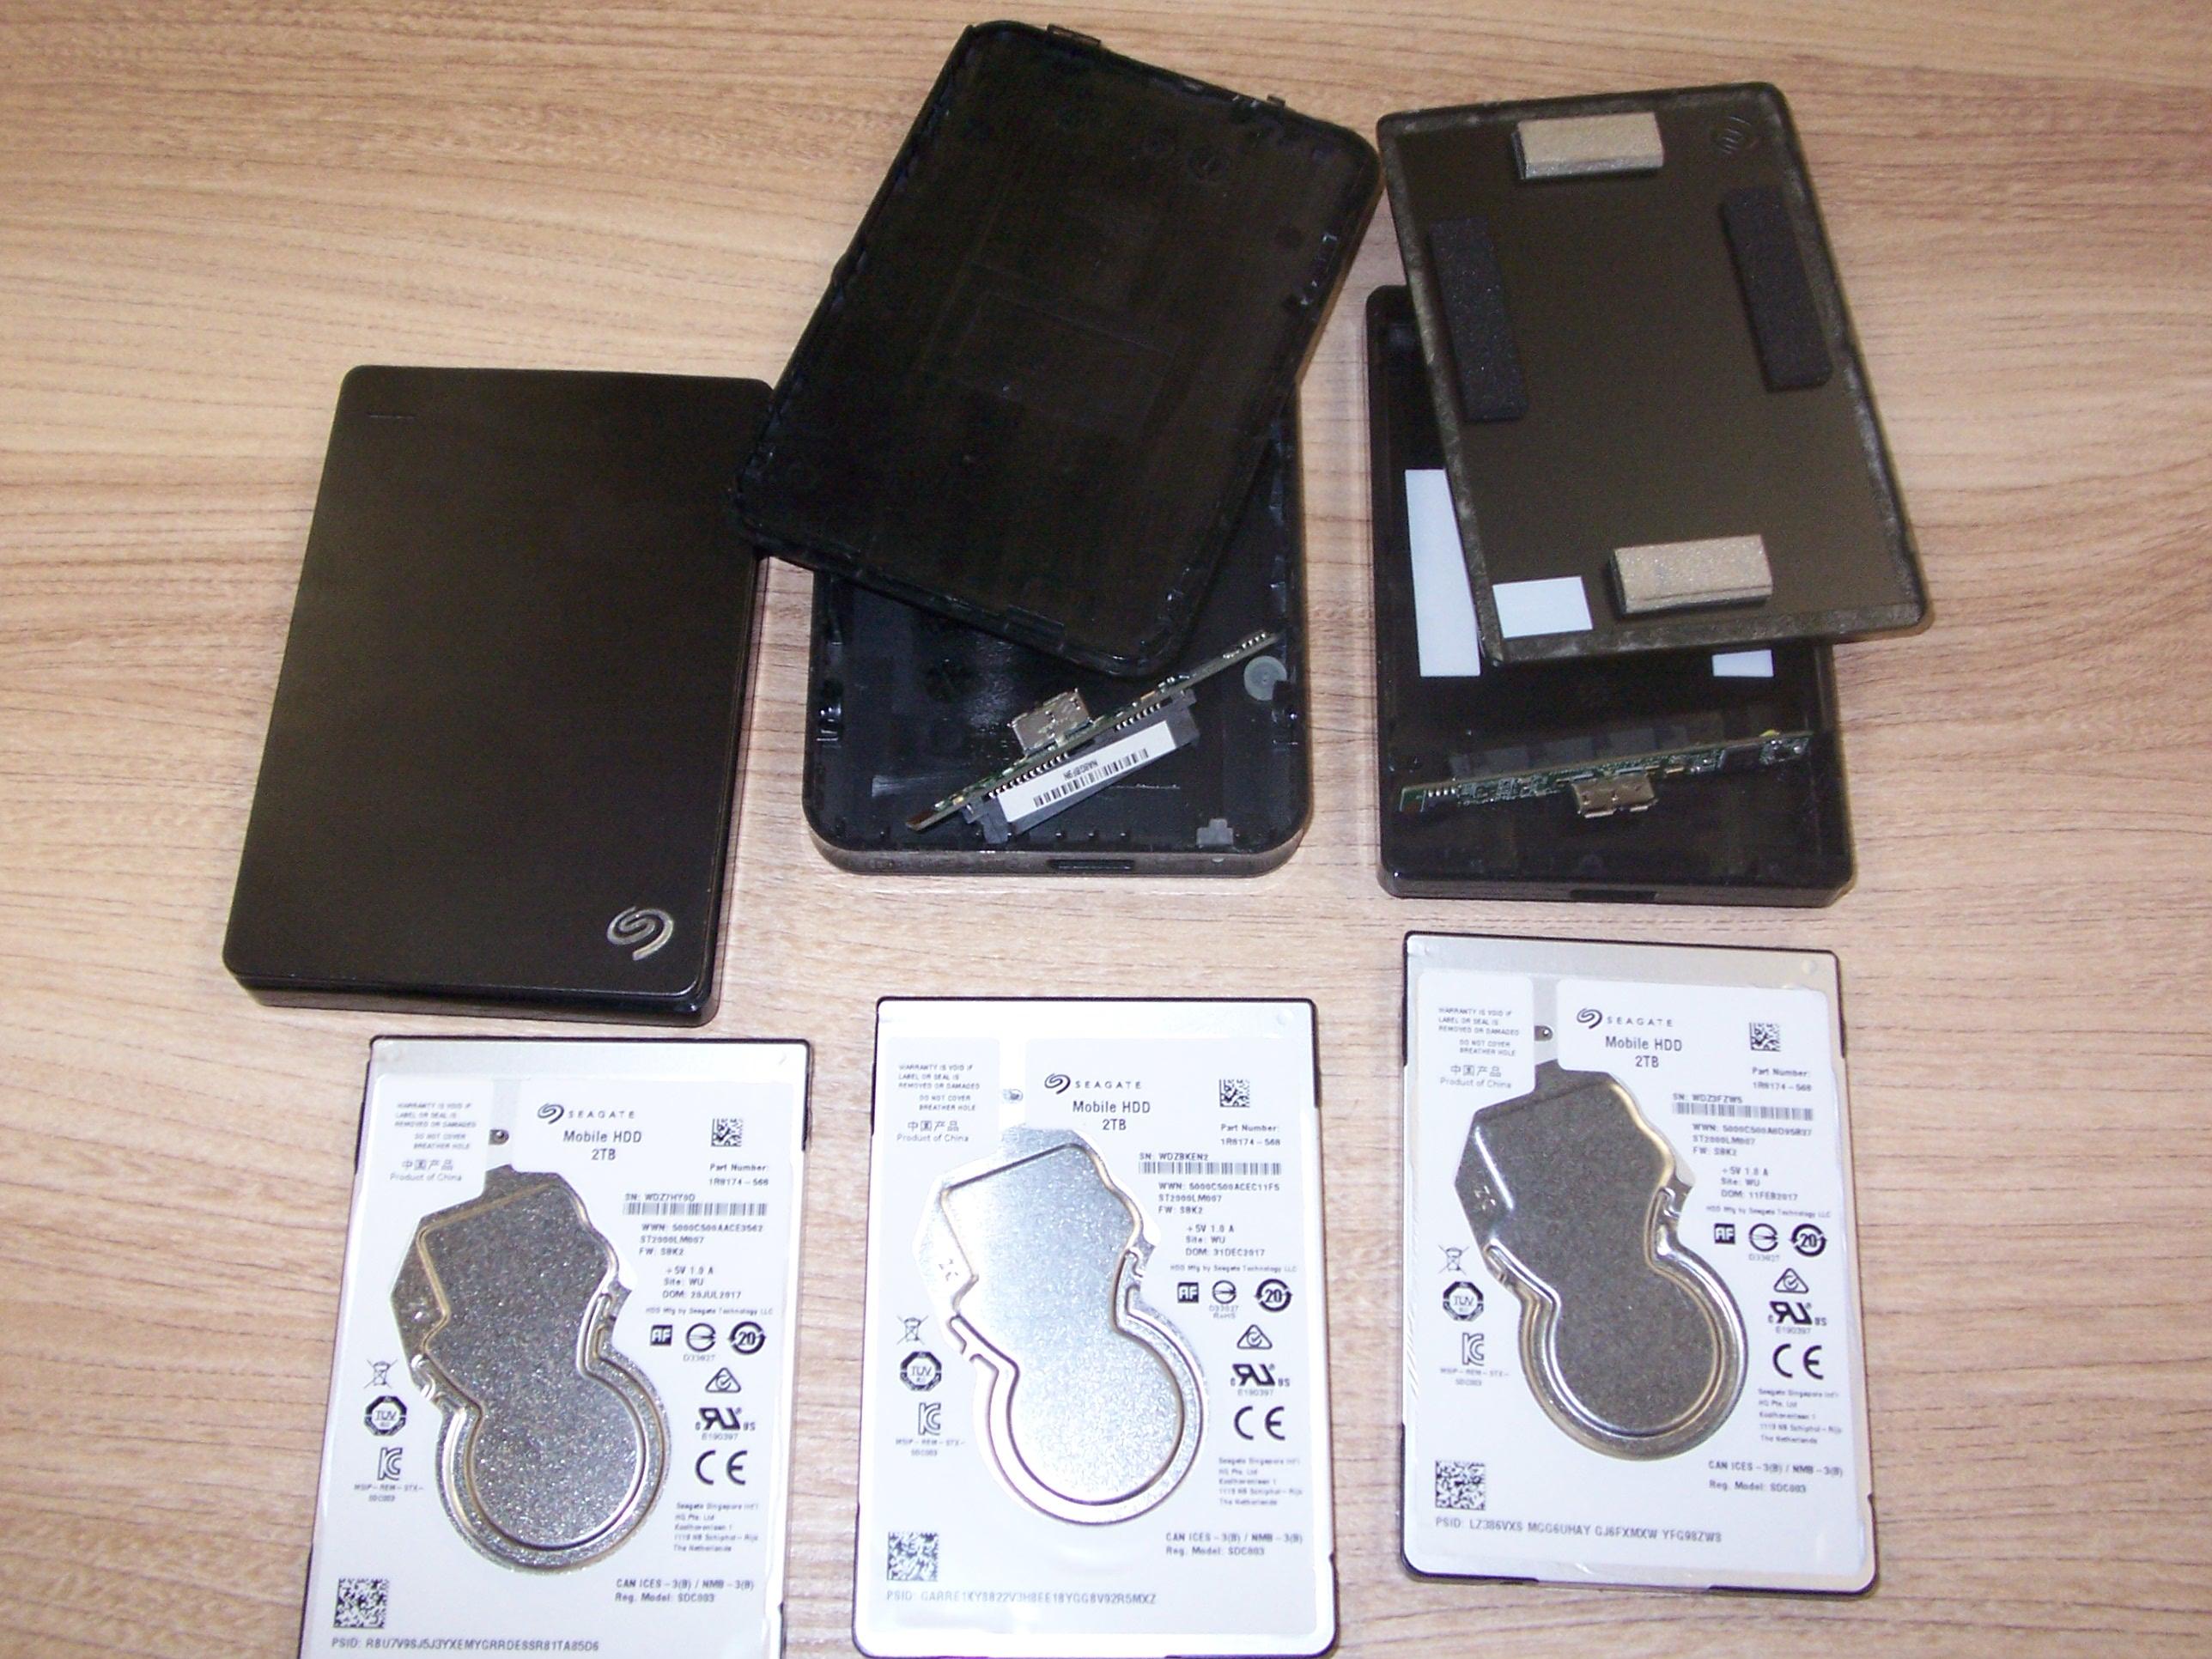 Trzy dyski Seagate Mobile HDD wraz z obudowami Seagate Backup Plus Portable Drive i Maxtor M3 Portable